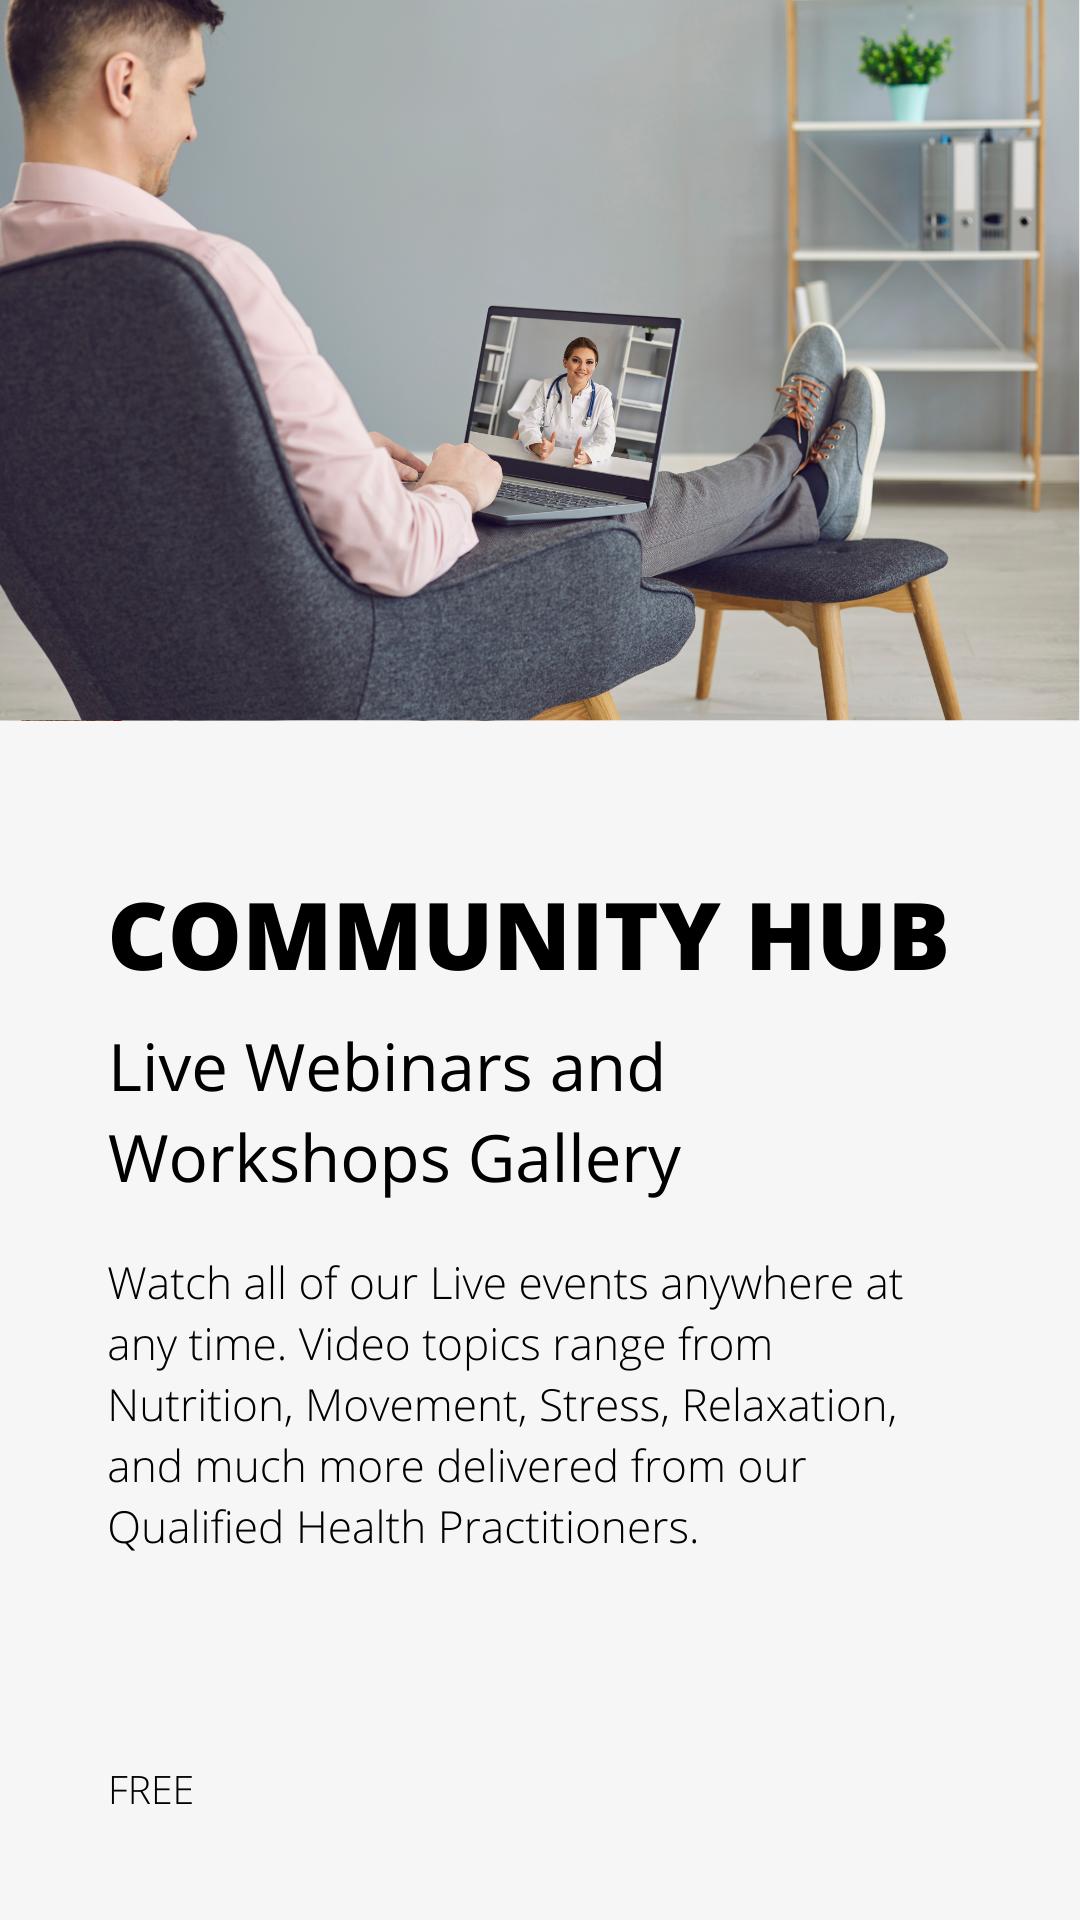 Community Hub free course icon